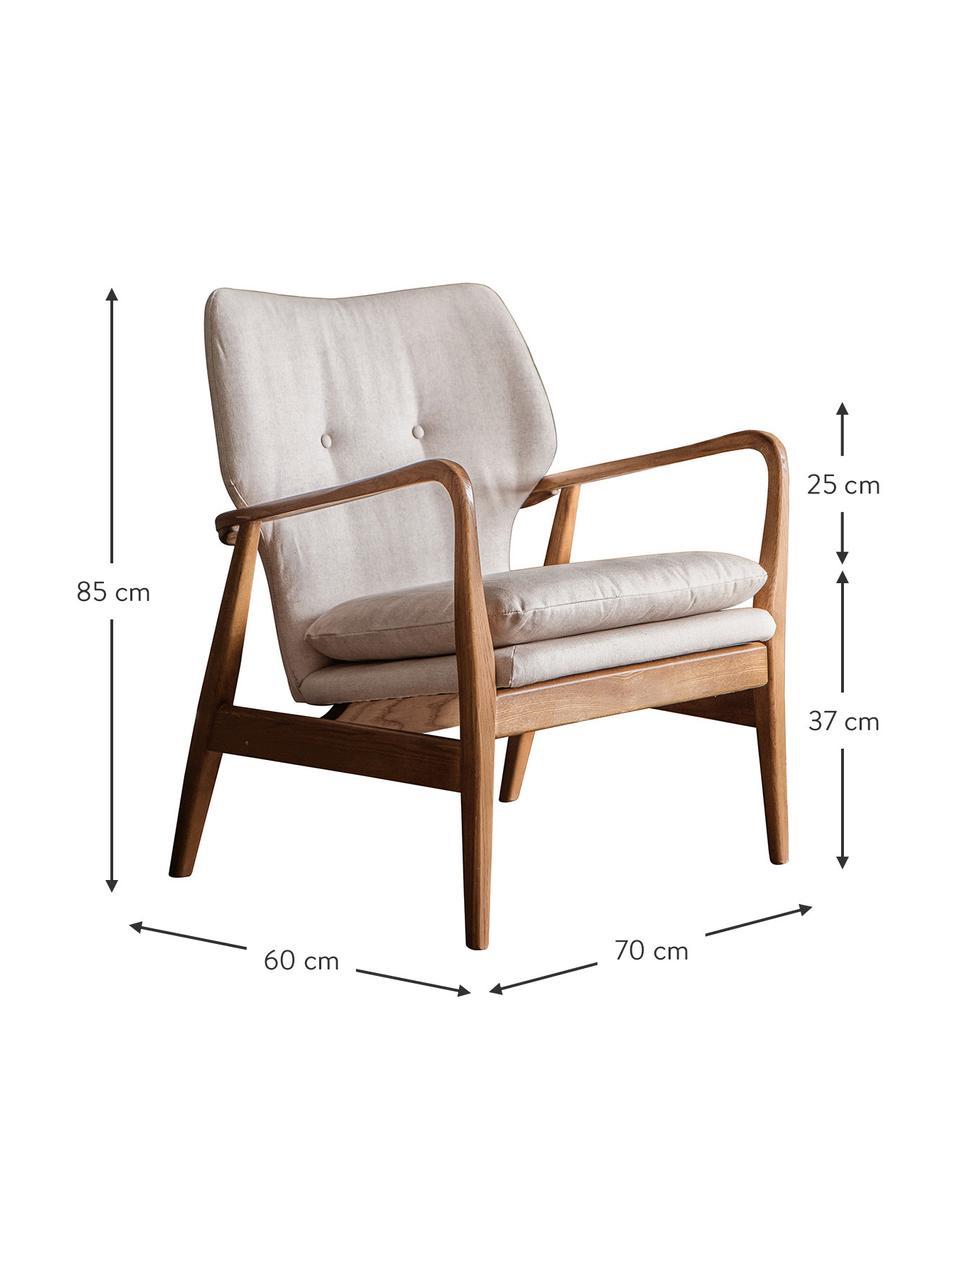 Loungefauteuil Jomlin van eikenhout, Bekleding: linnen, Frame: eikenhout, Beige, 70 x 60 cm